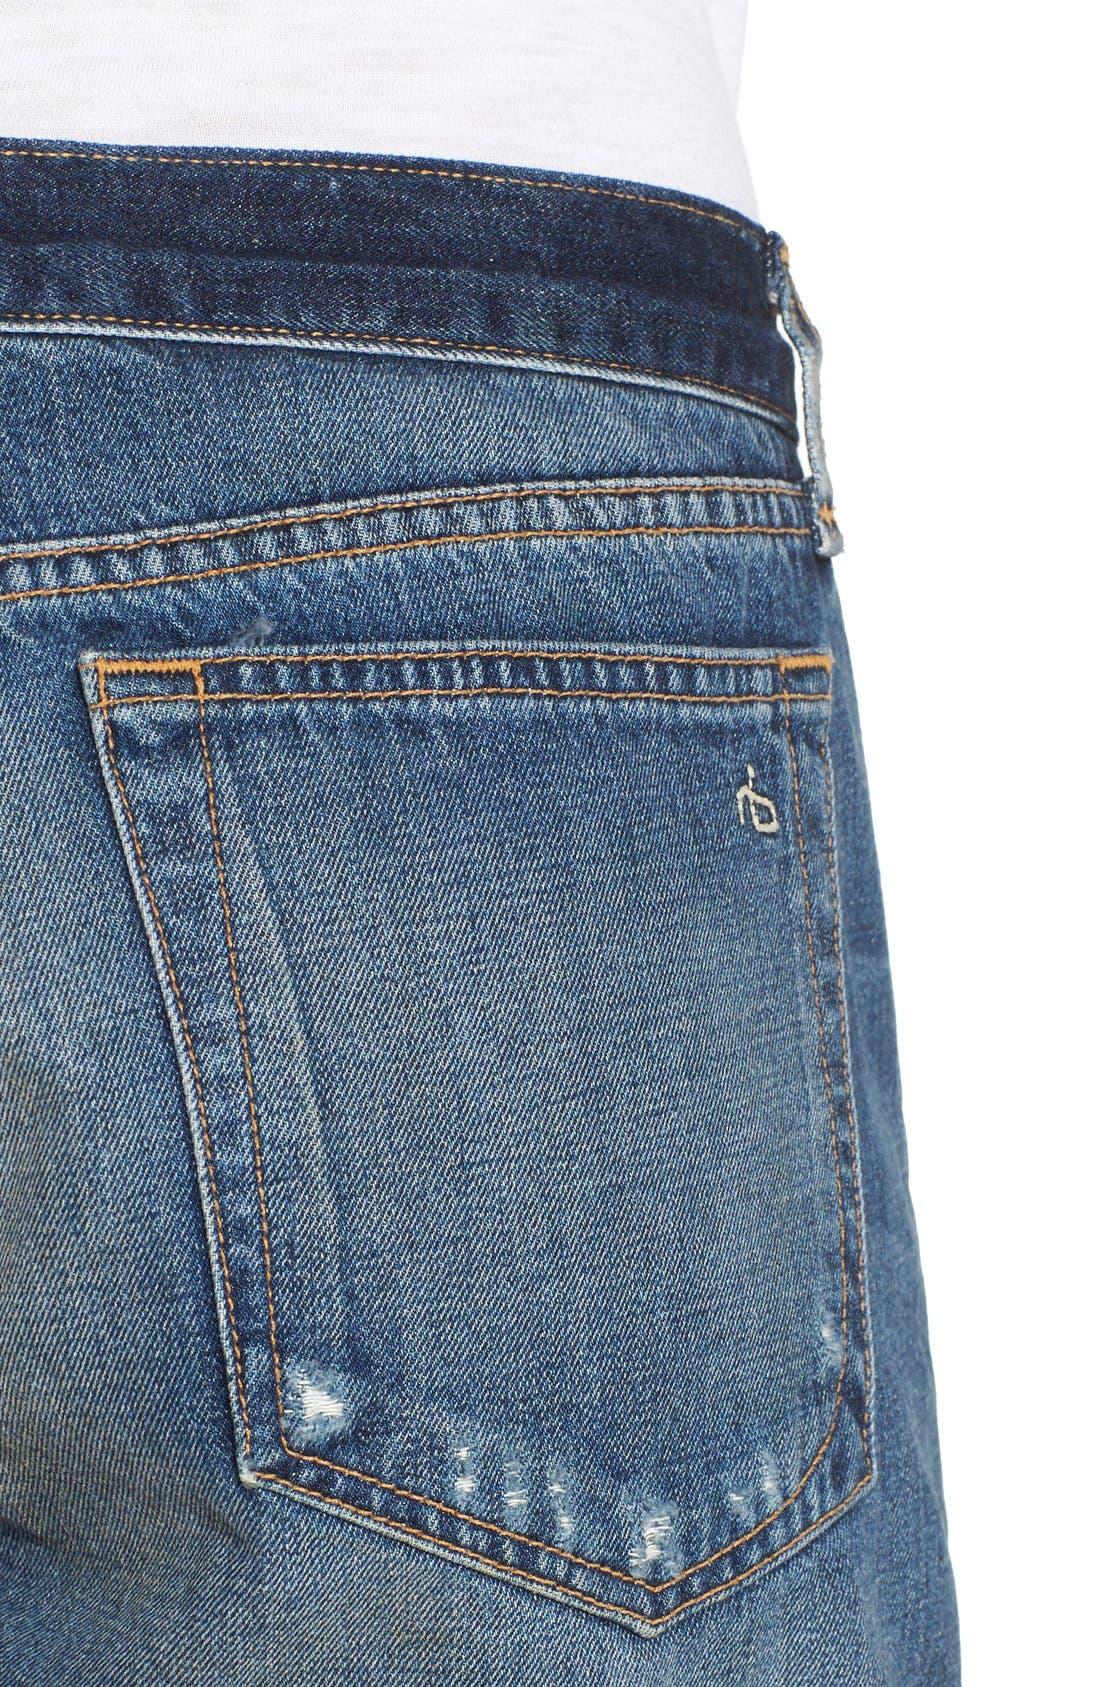 Alternate Image 4  - rag & bone 'Boyfriend' Cutoff Denim Shorts (Woodstock)